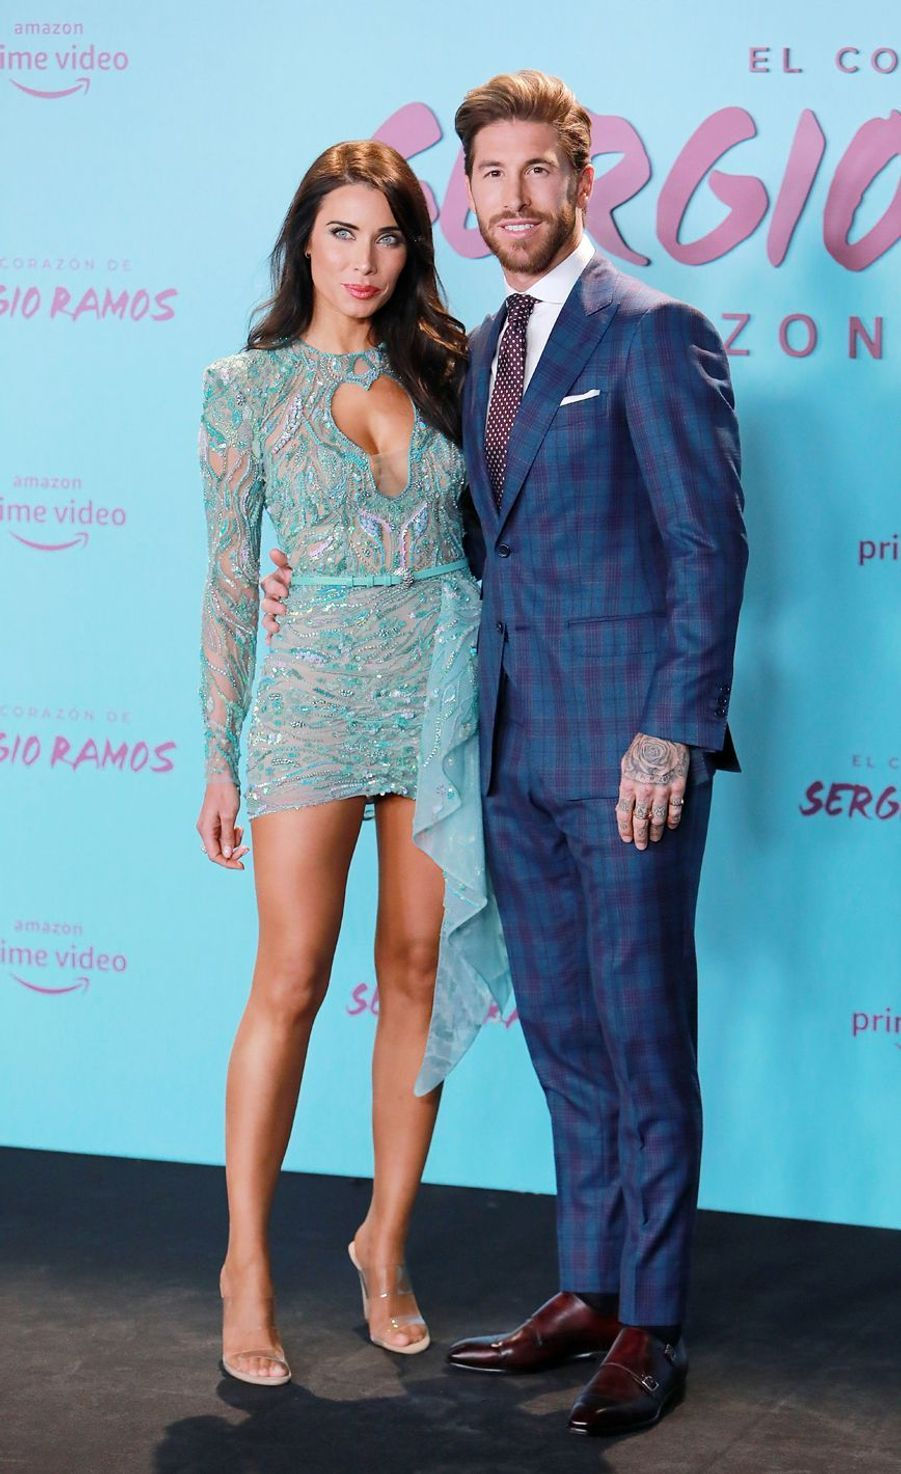 Sergio Ramos et son épouse Pilar Rubio à la première de«El Corazon de Sergio Ramos», à Madrid